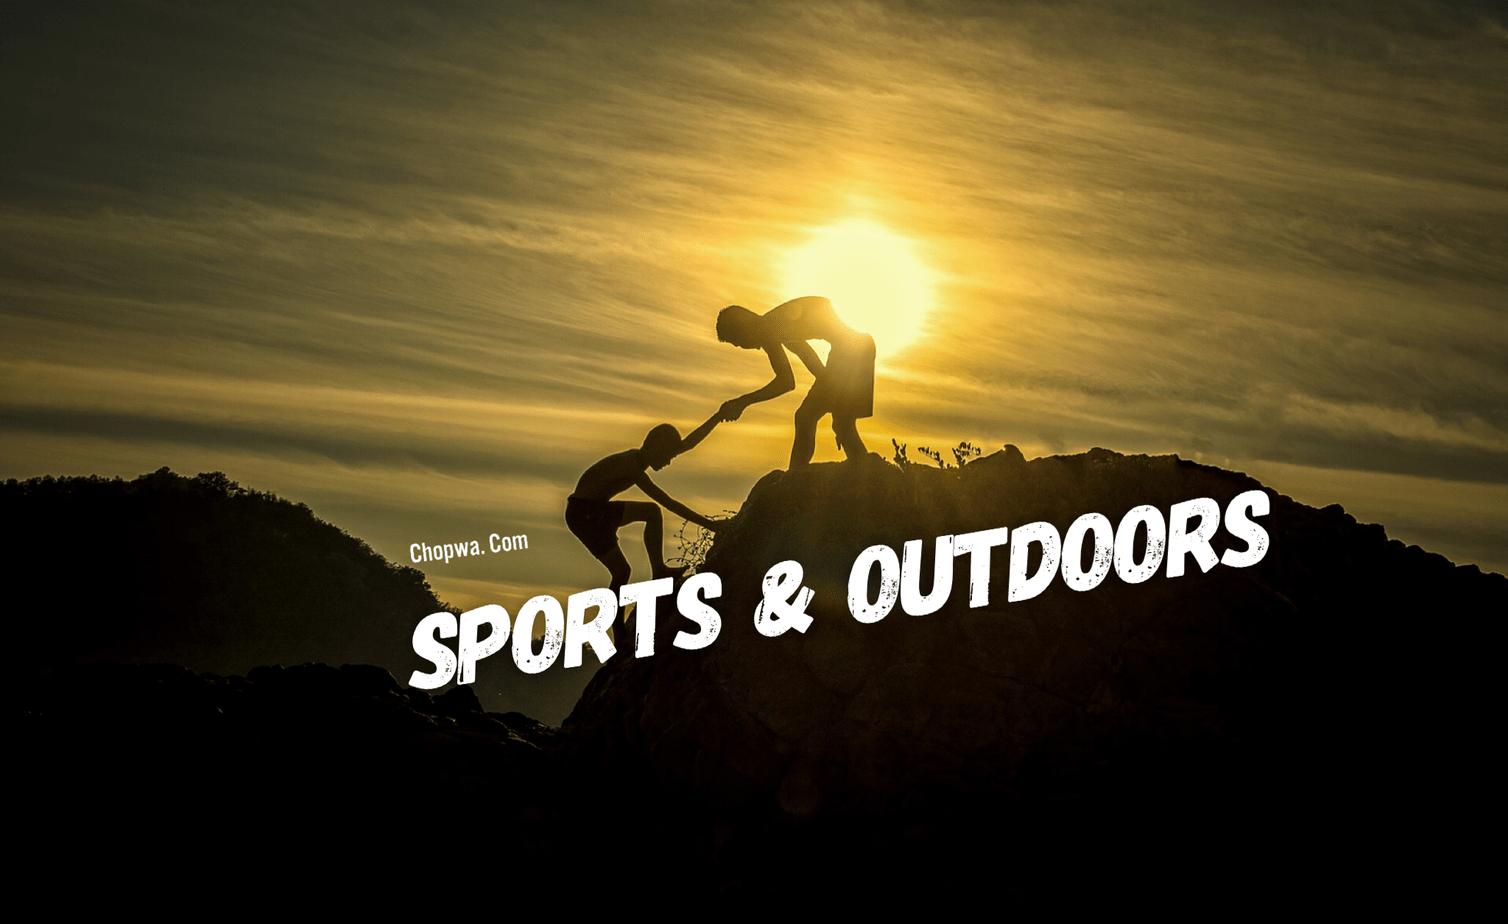 Chopwa- Sports and outdoors